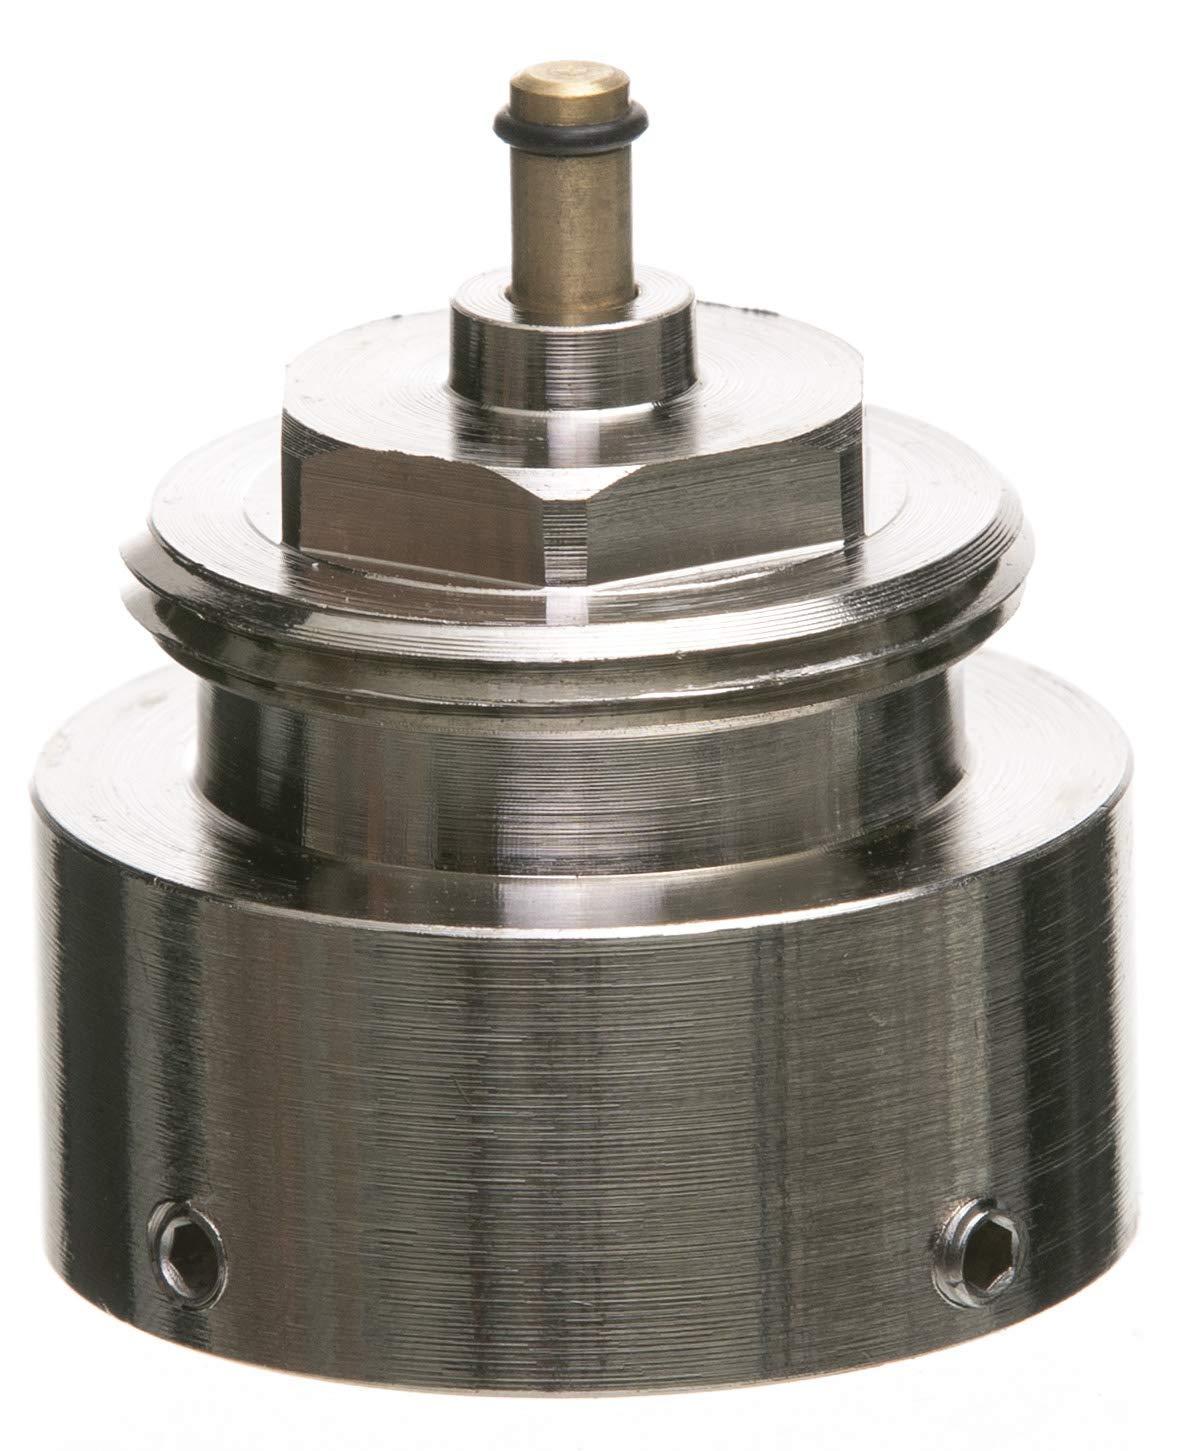 TA Heimeier Vaillant 9700-27.700 Adaptor Connector 30 mm